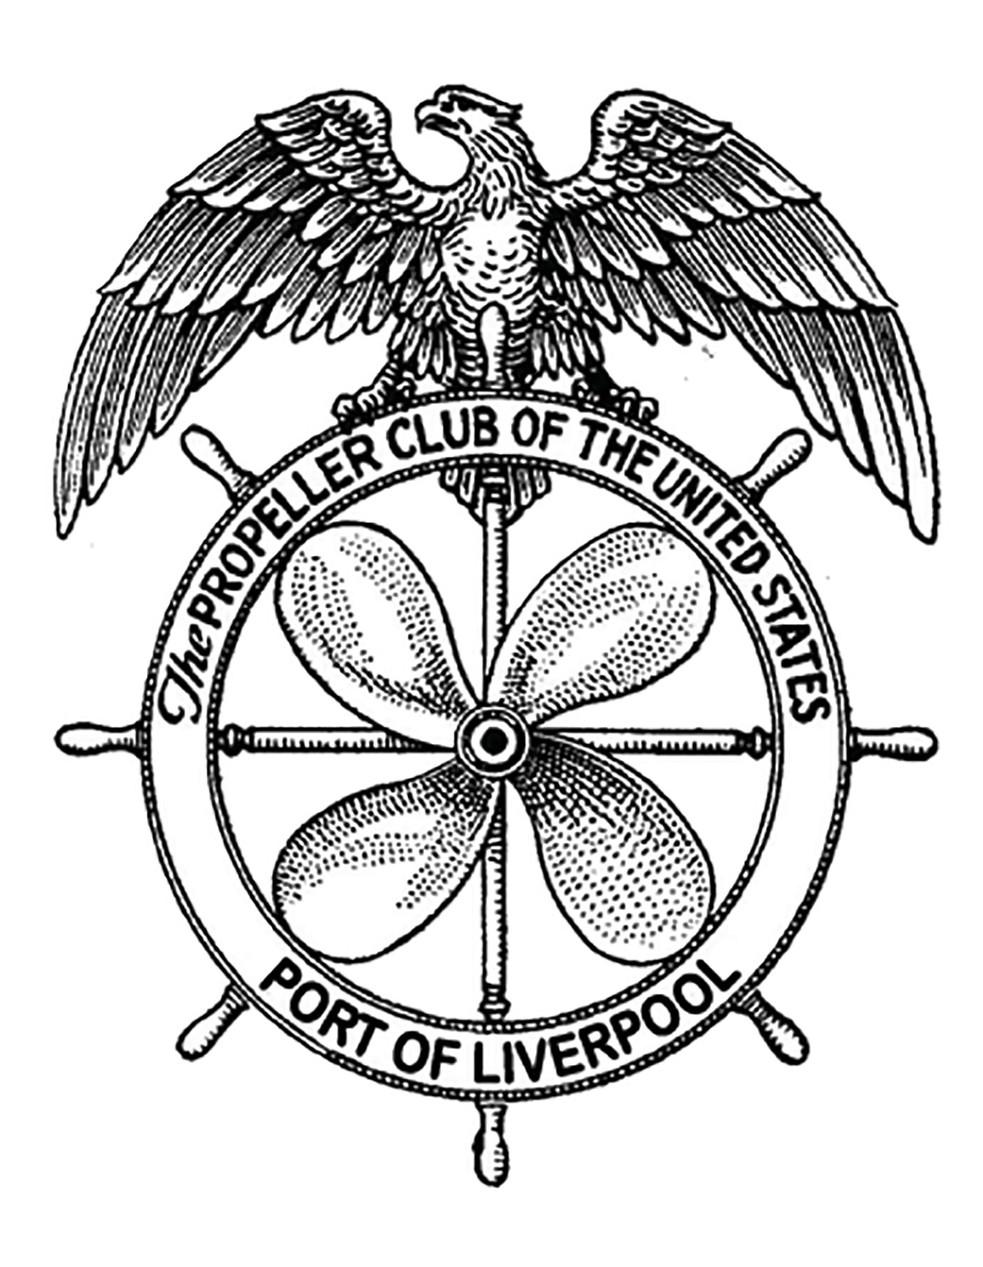 Liverpool Propeller Club